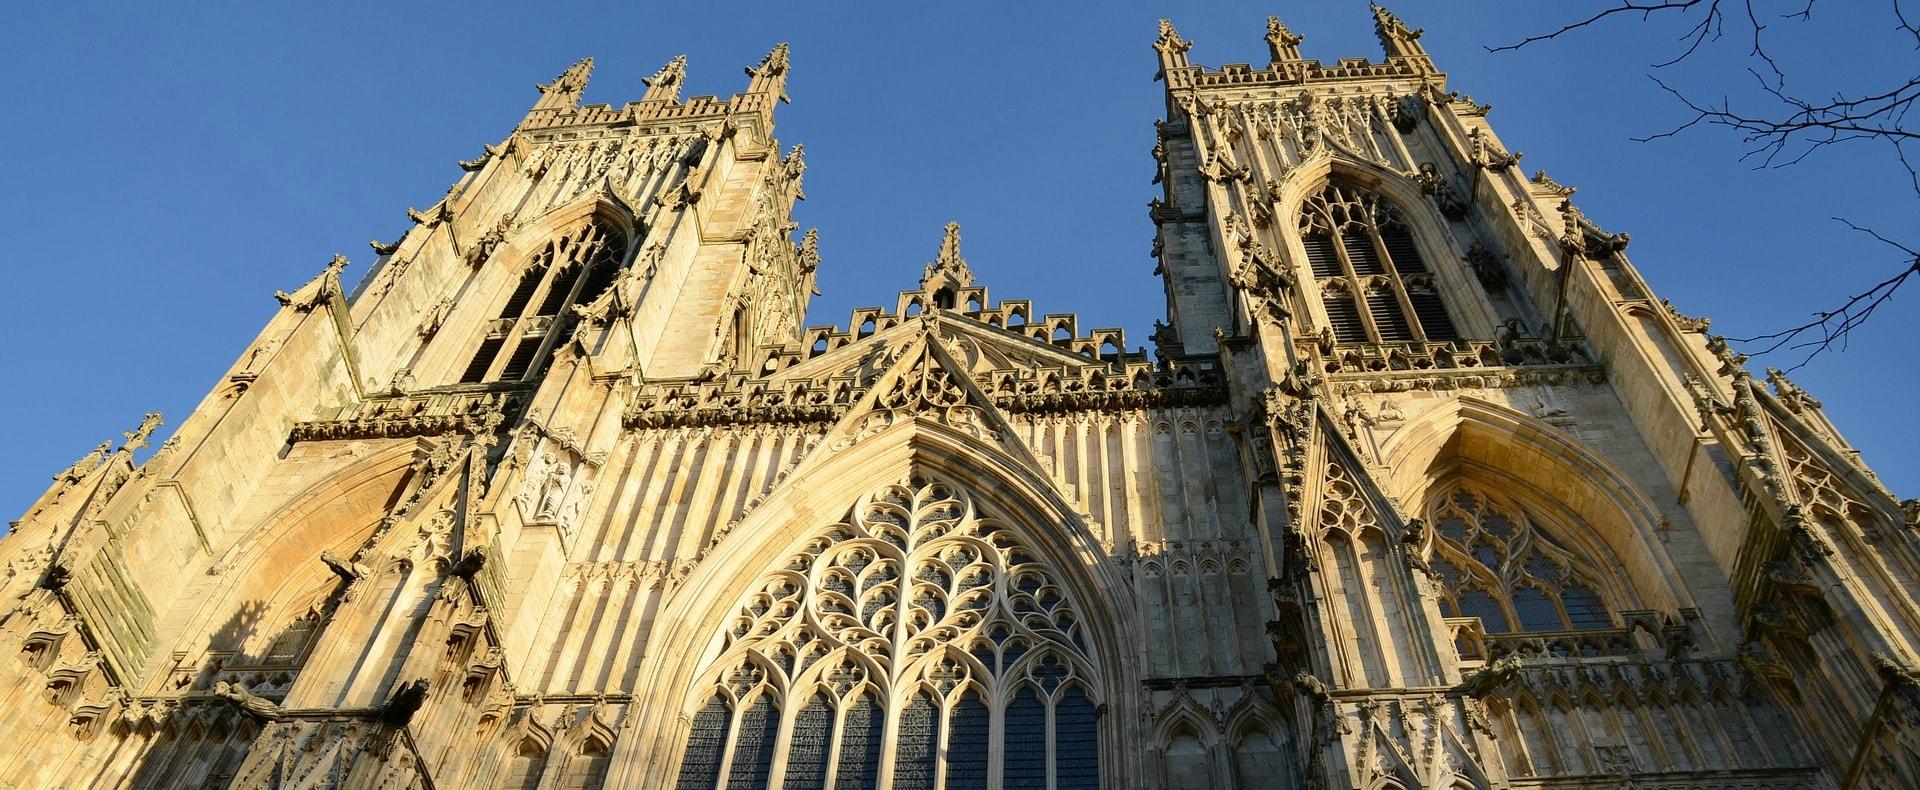 York, United Kingdom